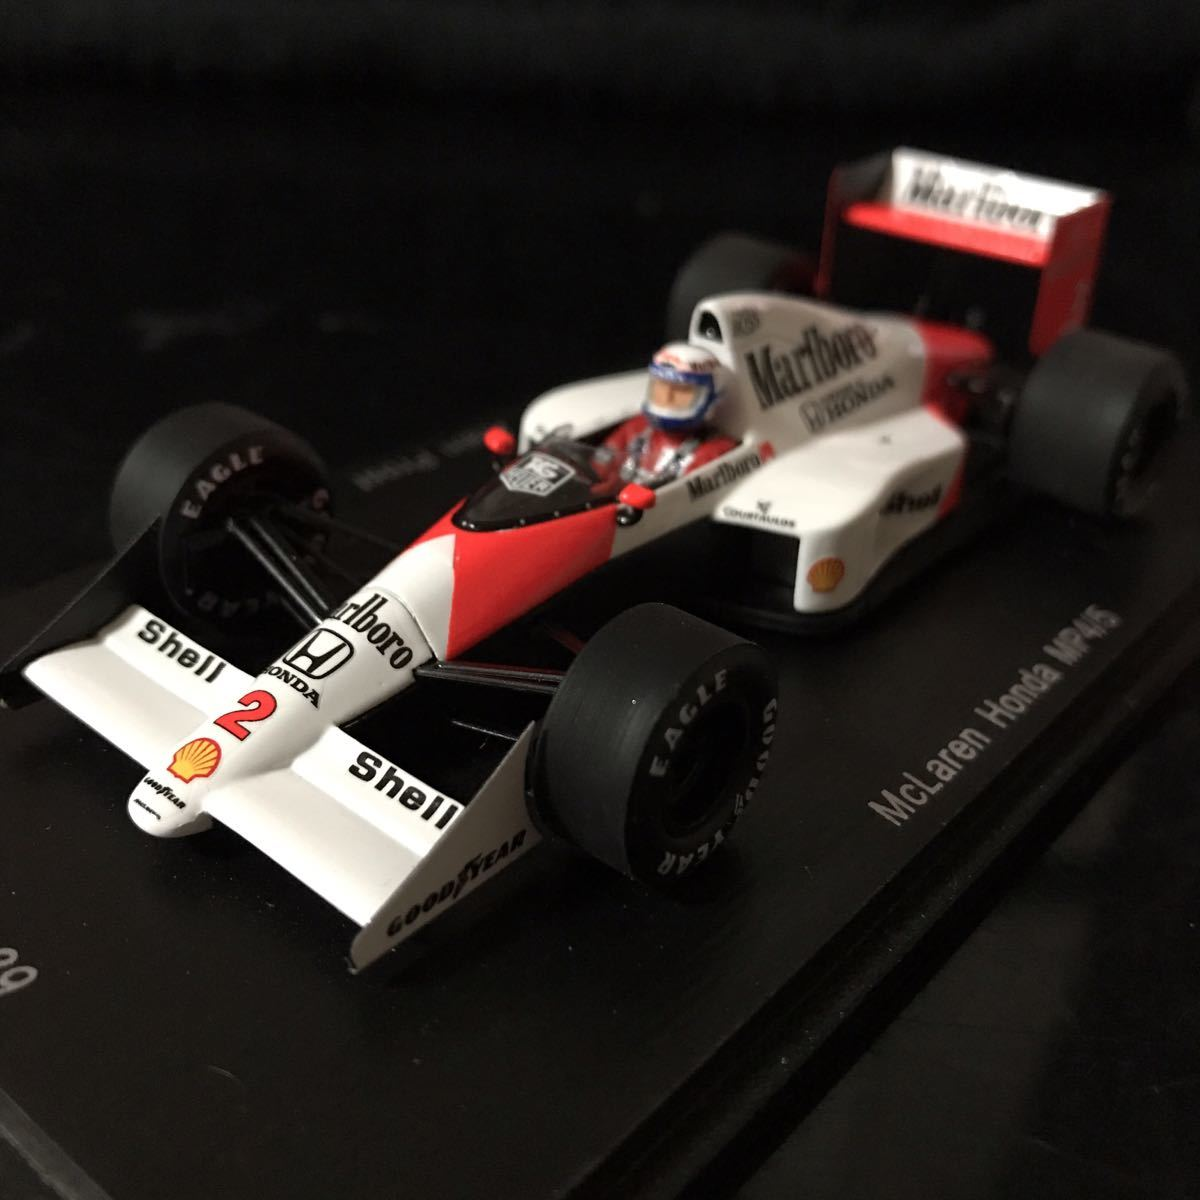 ES別注 スパーク 1/43 ホンダ マールボロ マクラーレン MP4/5 #2 A.プロスト 1989 ワールドチャンピオン マルボロ仕様_画像2